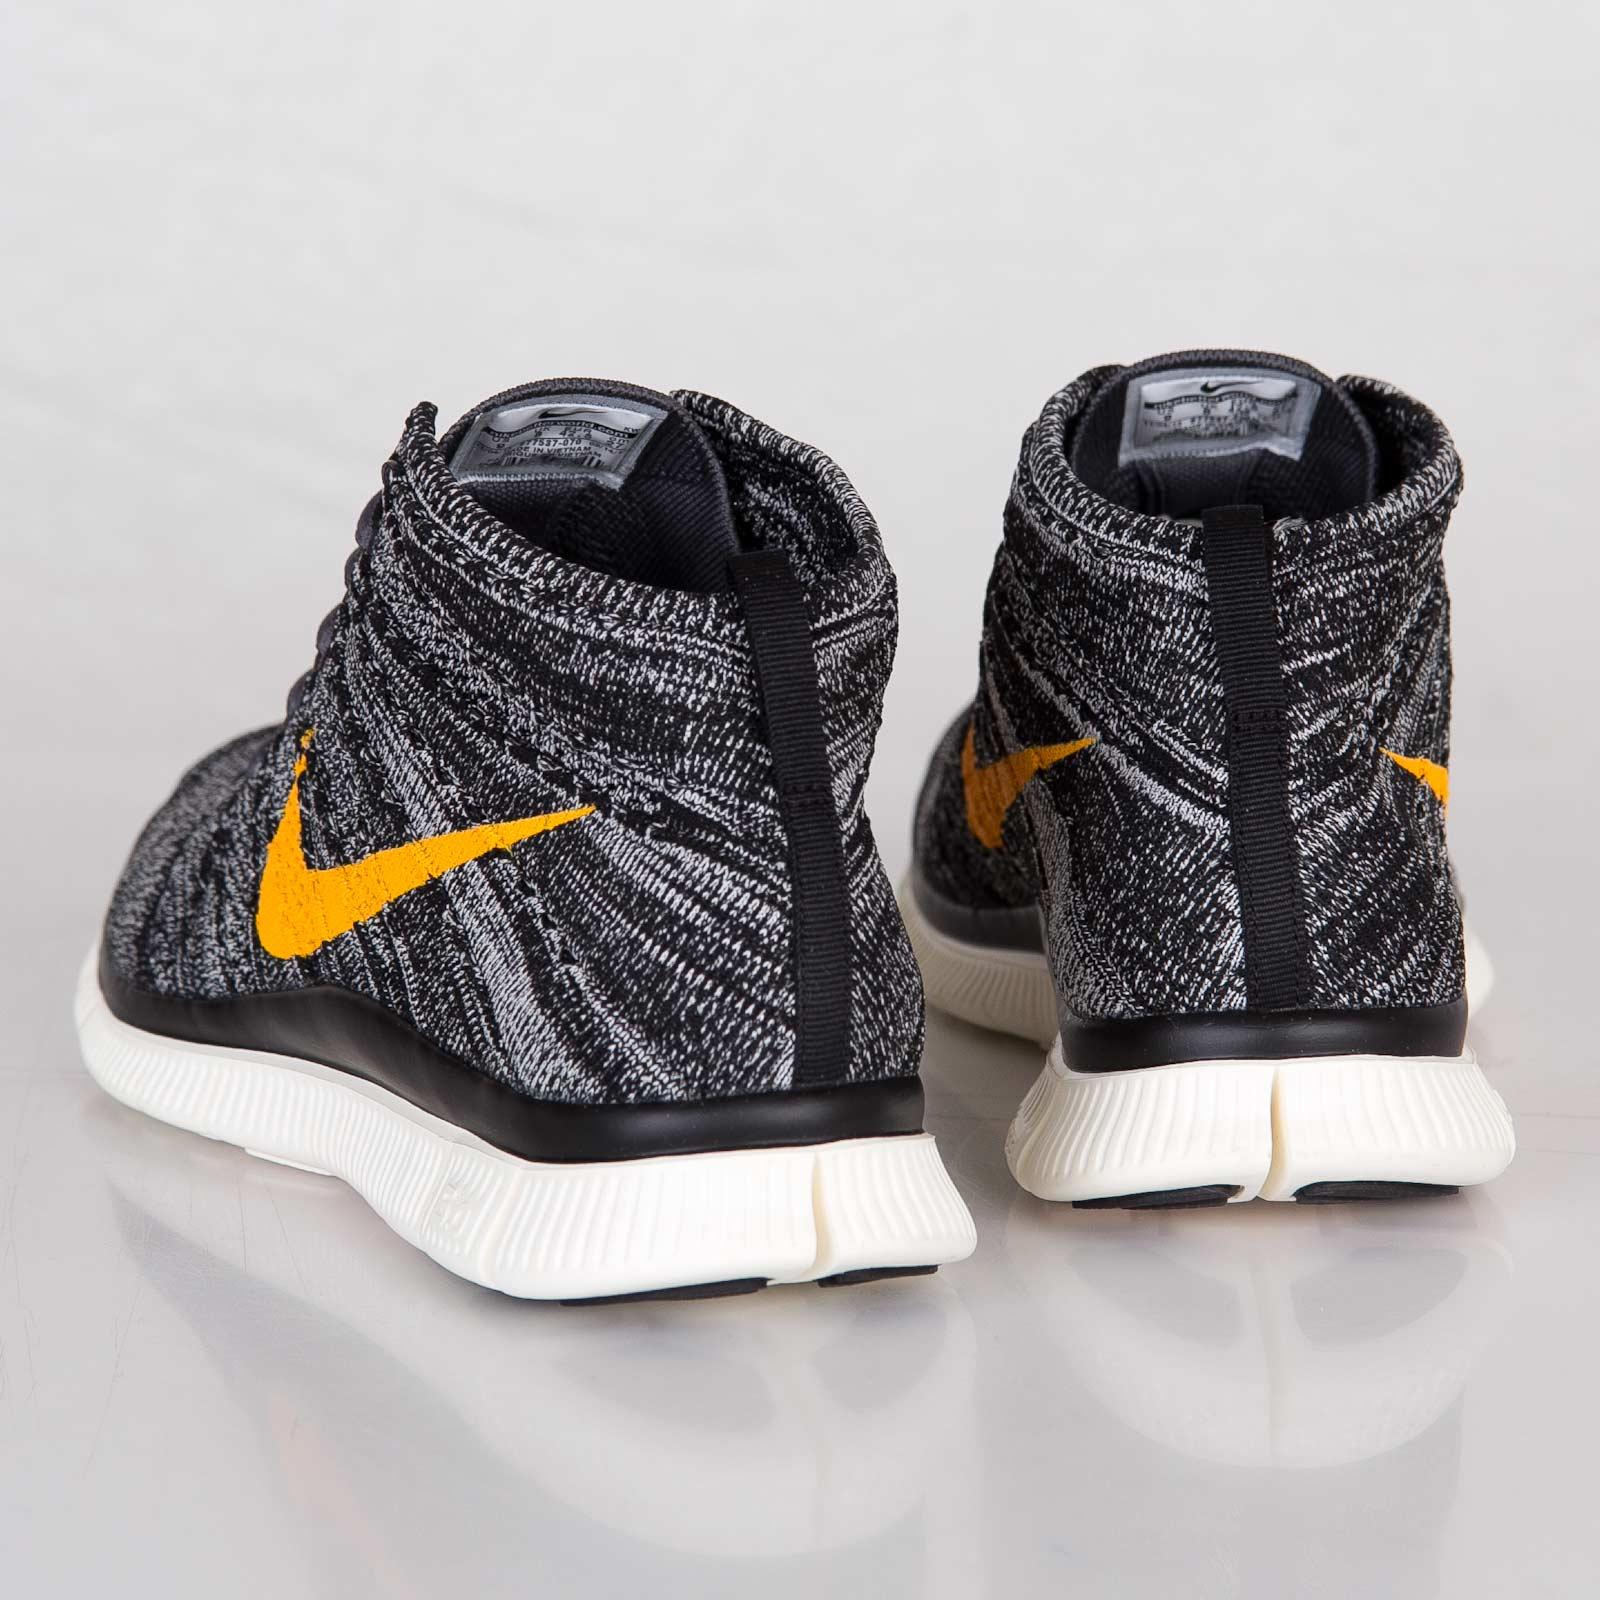 a53a3ccb5b8 Nike Free Flyknit Chukka SP - 677537-070 - Sneakersnstuff